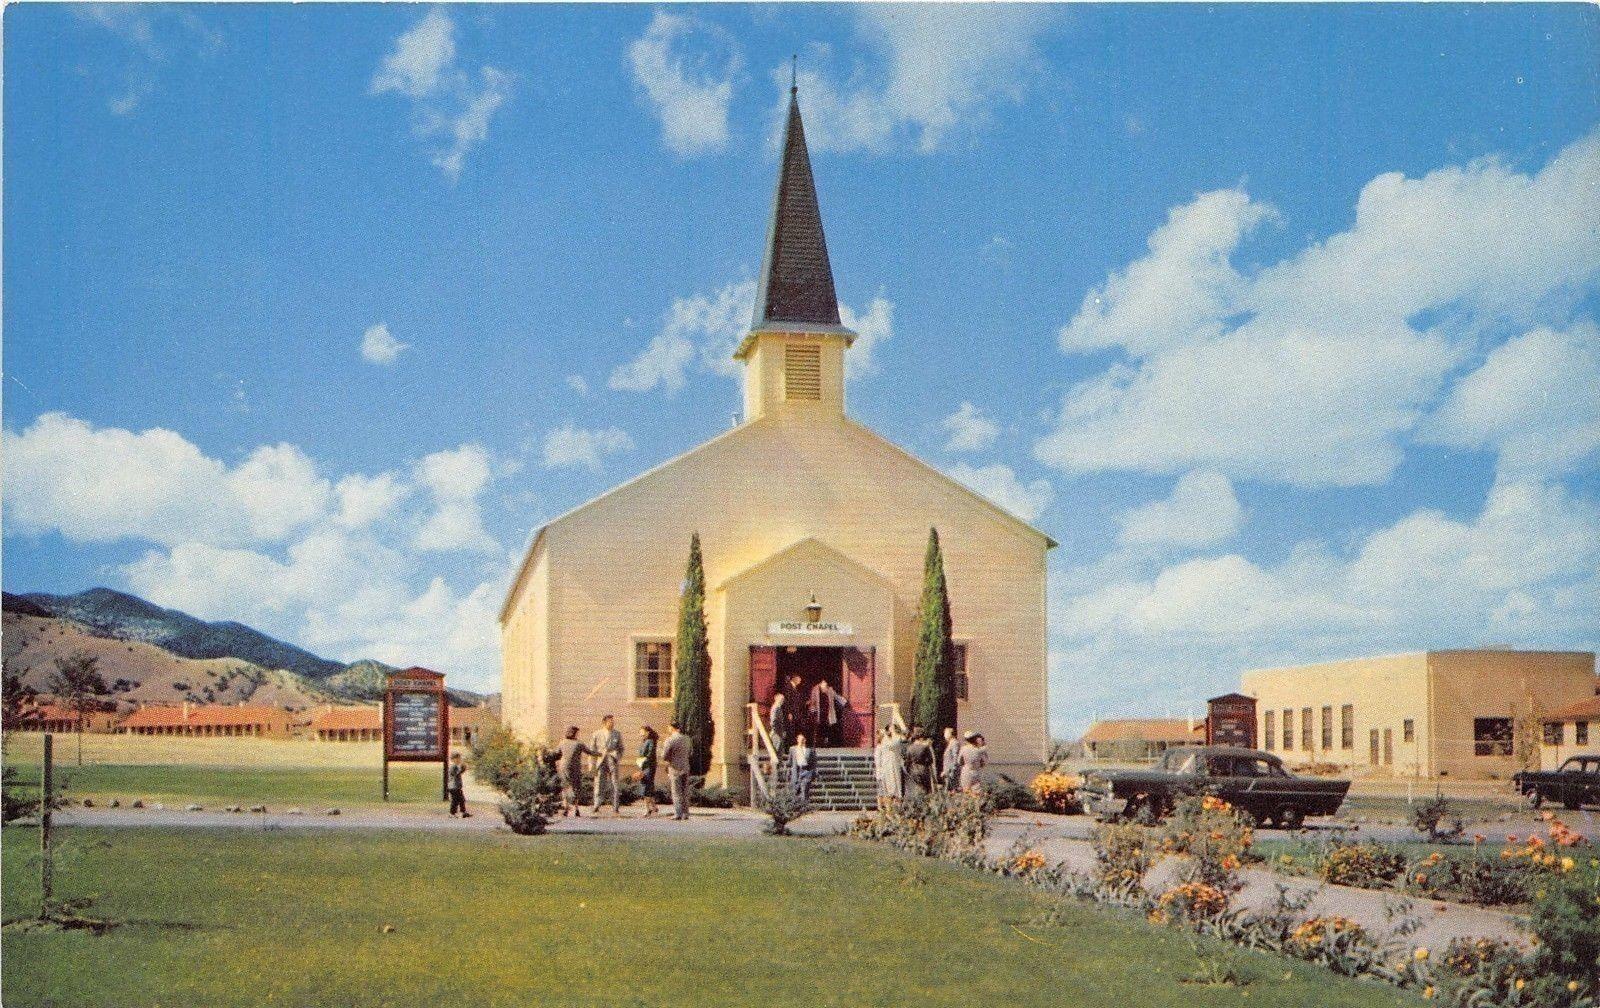 Fort Huachuca Main Post Chapel